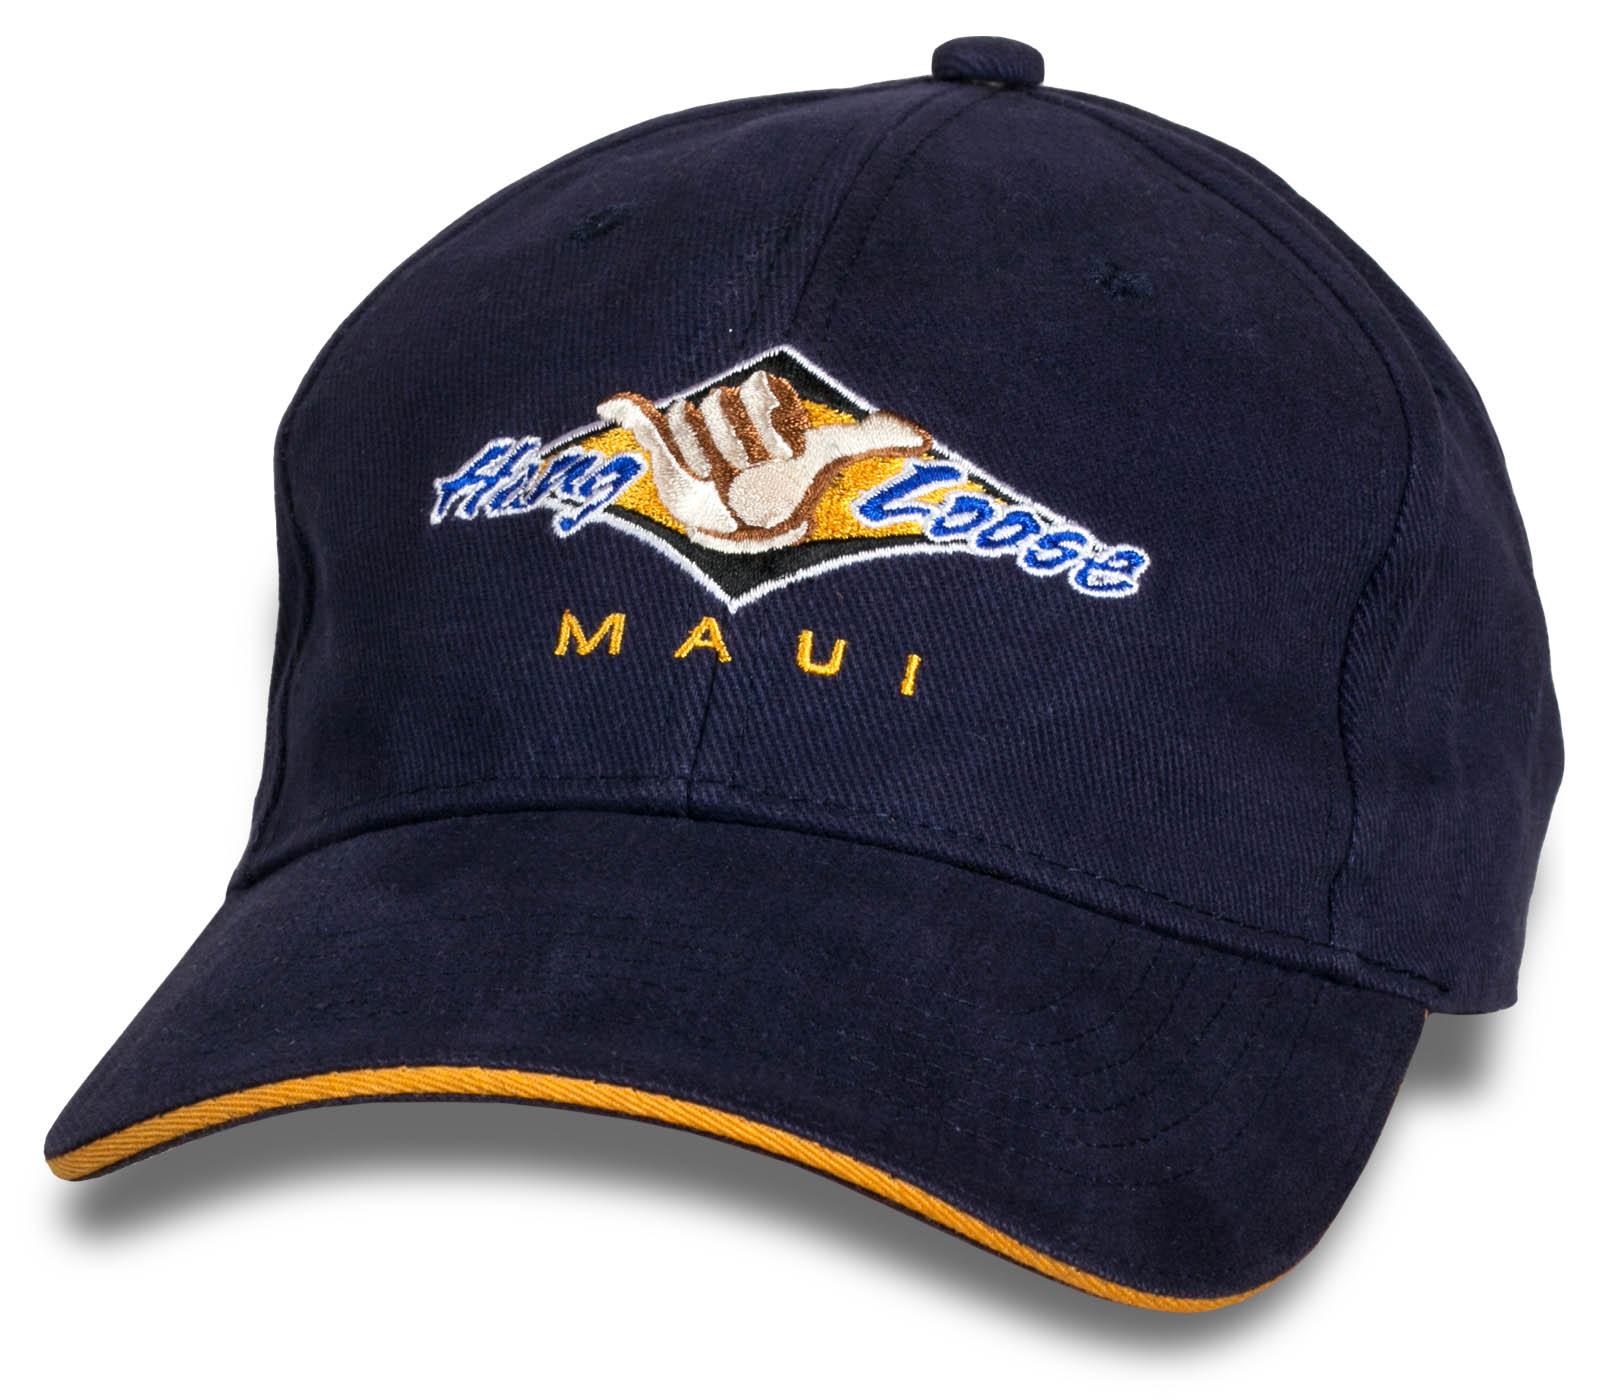 Темно-фиолетовая мужская кепка Hang Loose Maui.